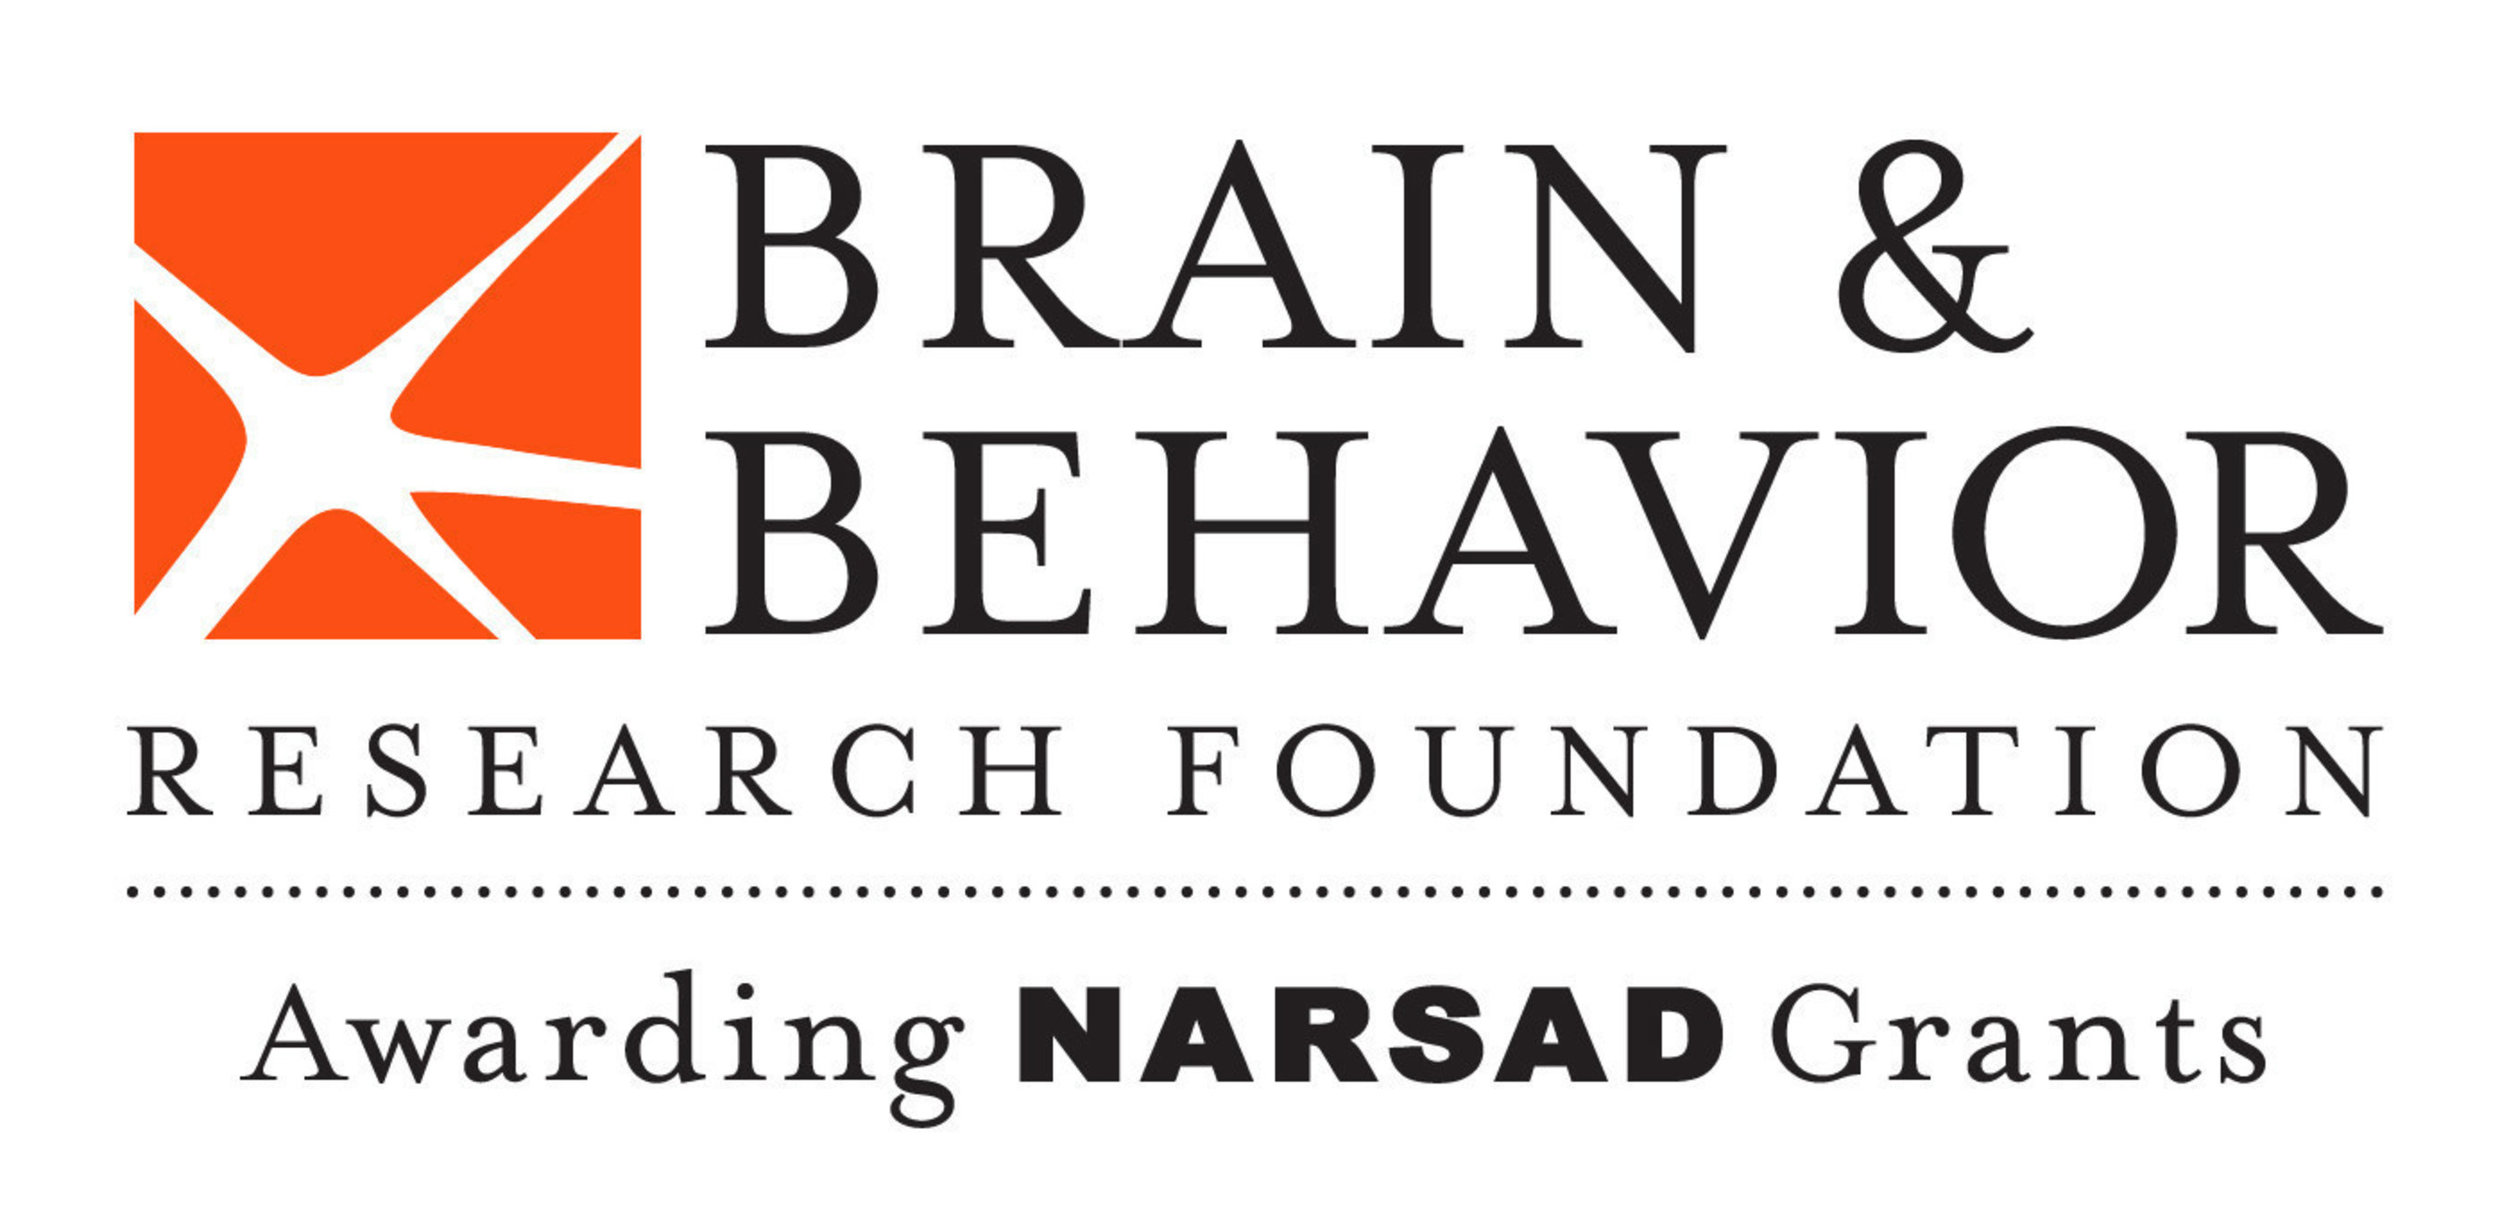 We were awarded a 2019 NARSAD Young Investigator Grant.